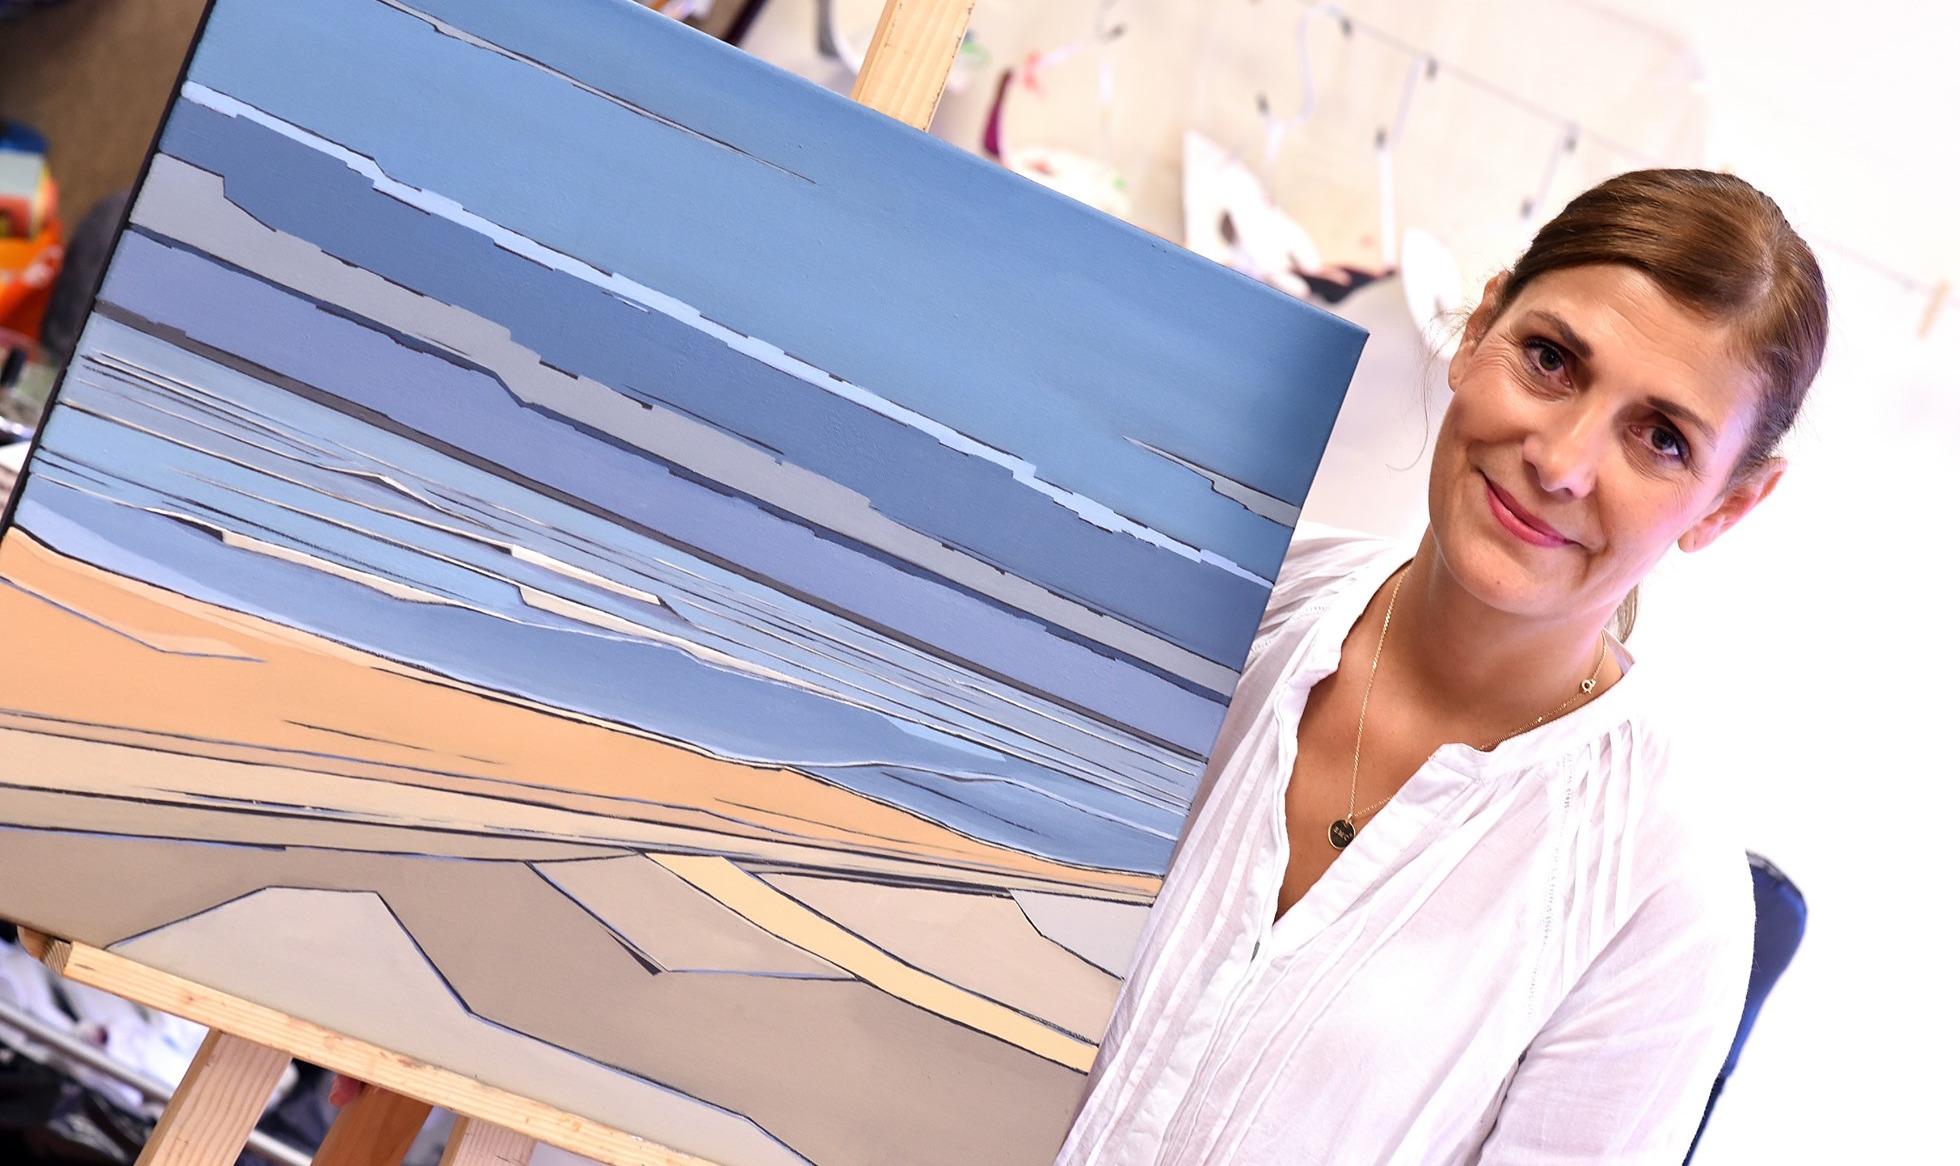 Mer et Structure : Christine Zima expose à l'espace Landowski